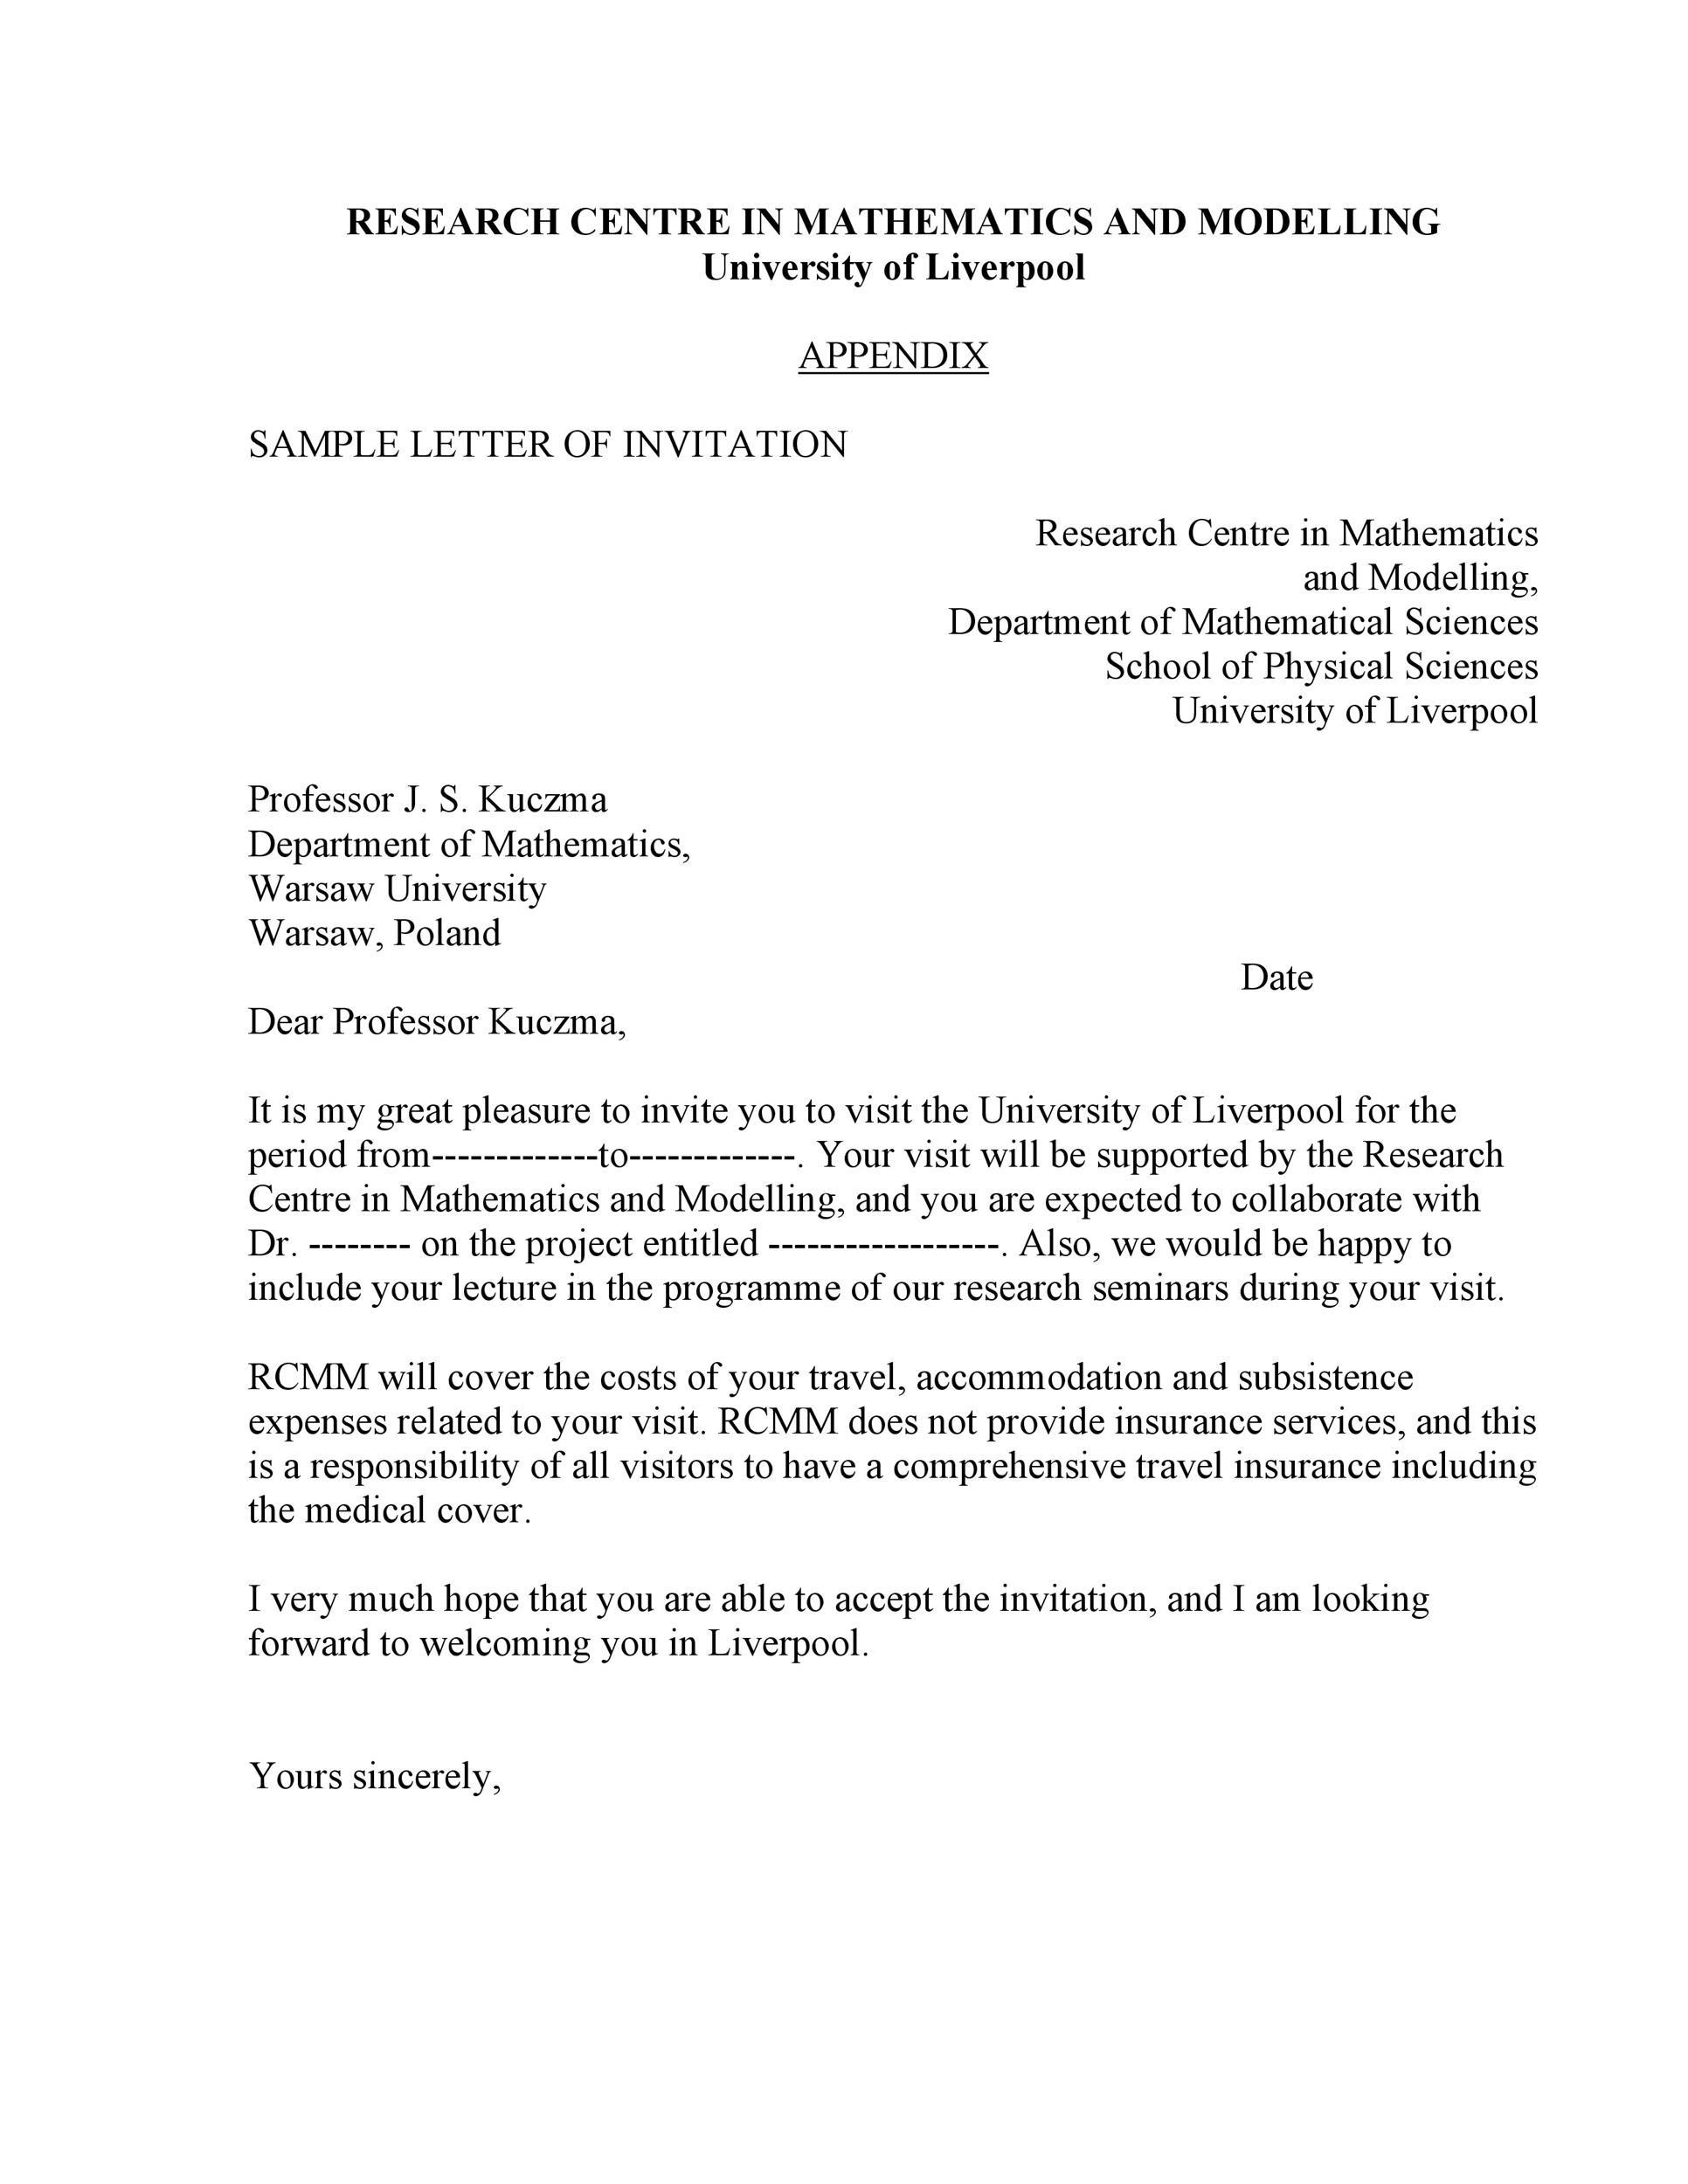 Free invitation letter 27